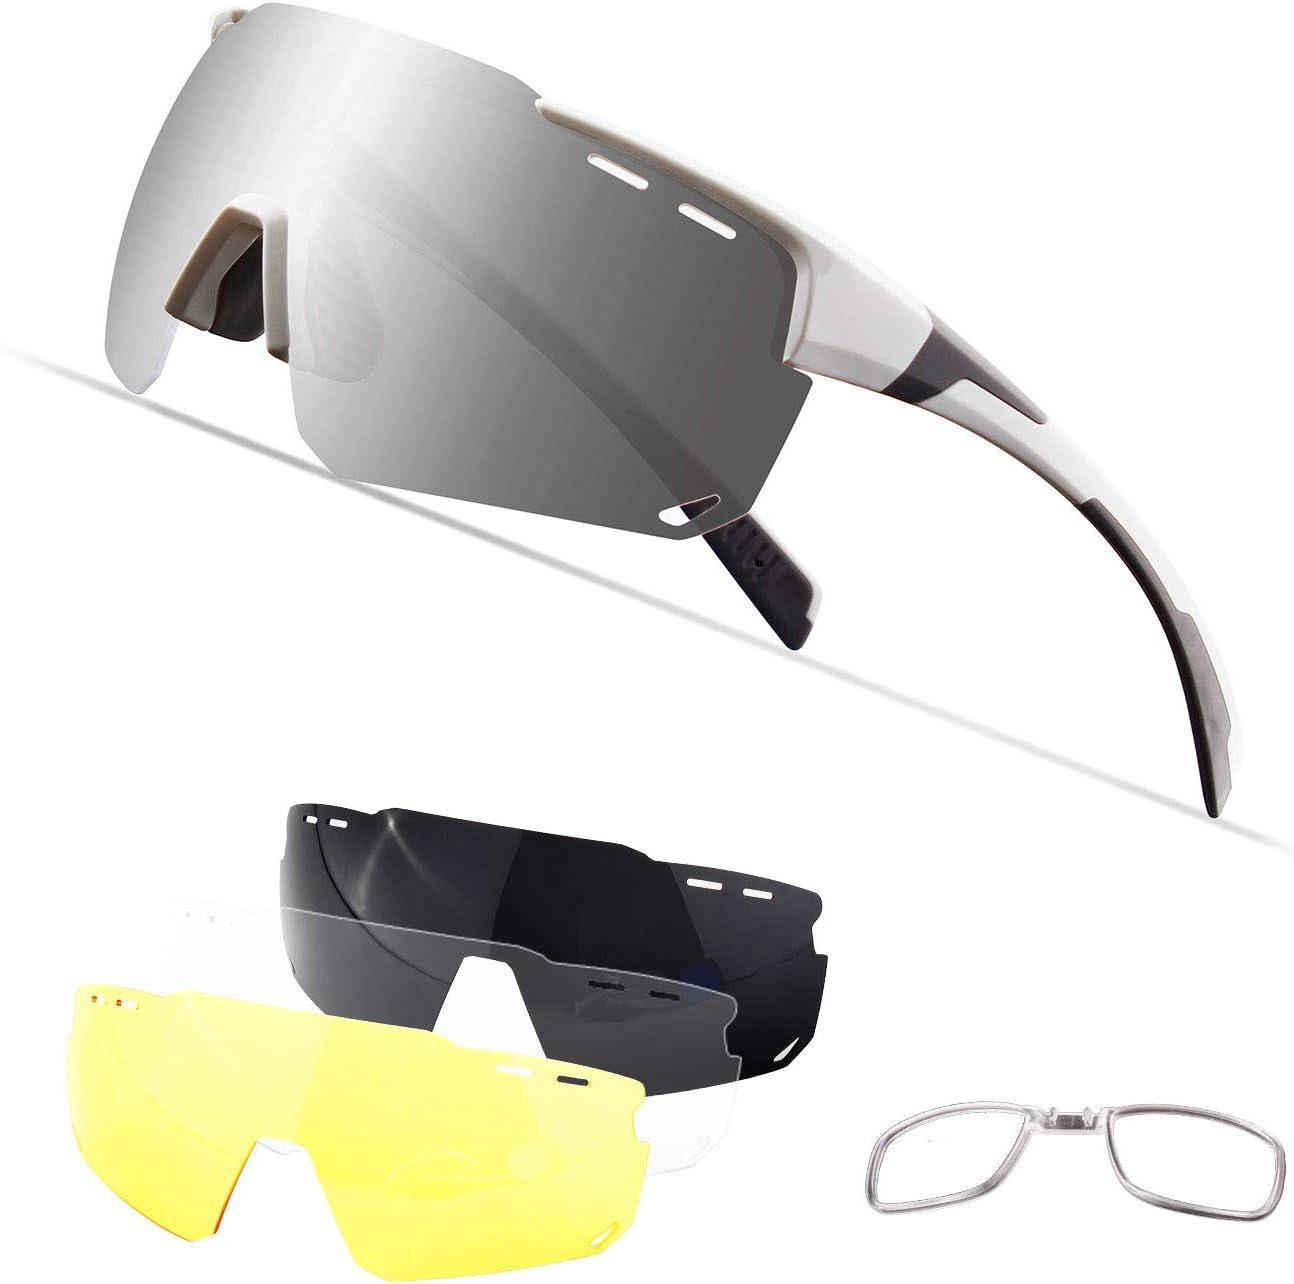 Xiyalai Cycling Sports Sunglasses,Polarized Glasses with 4 Interchangeable Lenses,Baseball Running Fishing Golf Driving Sunglasses